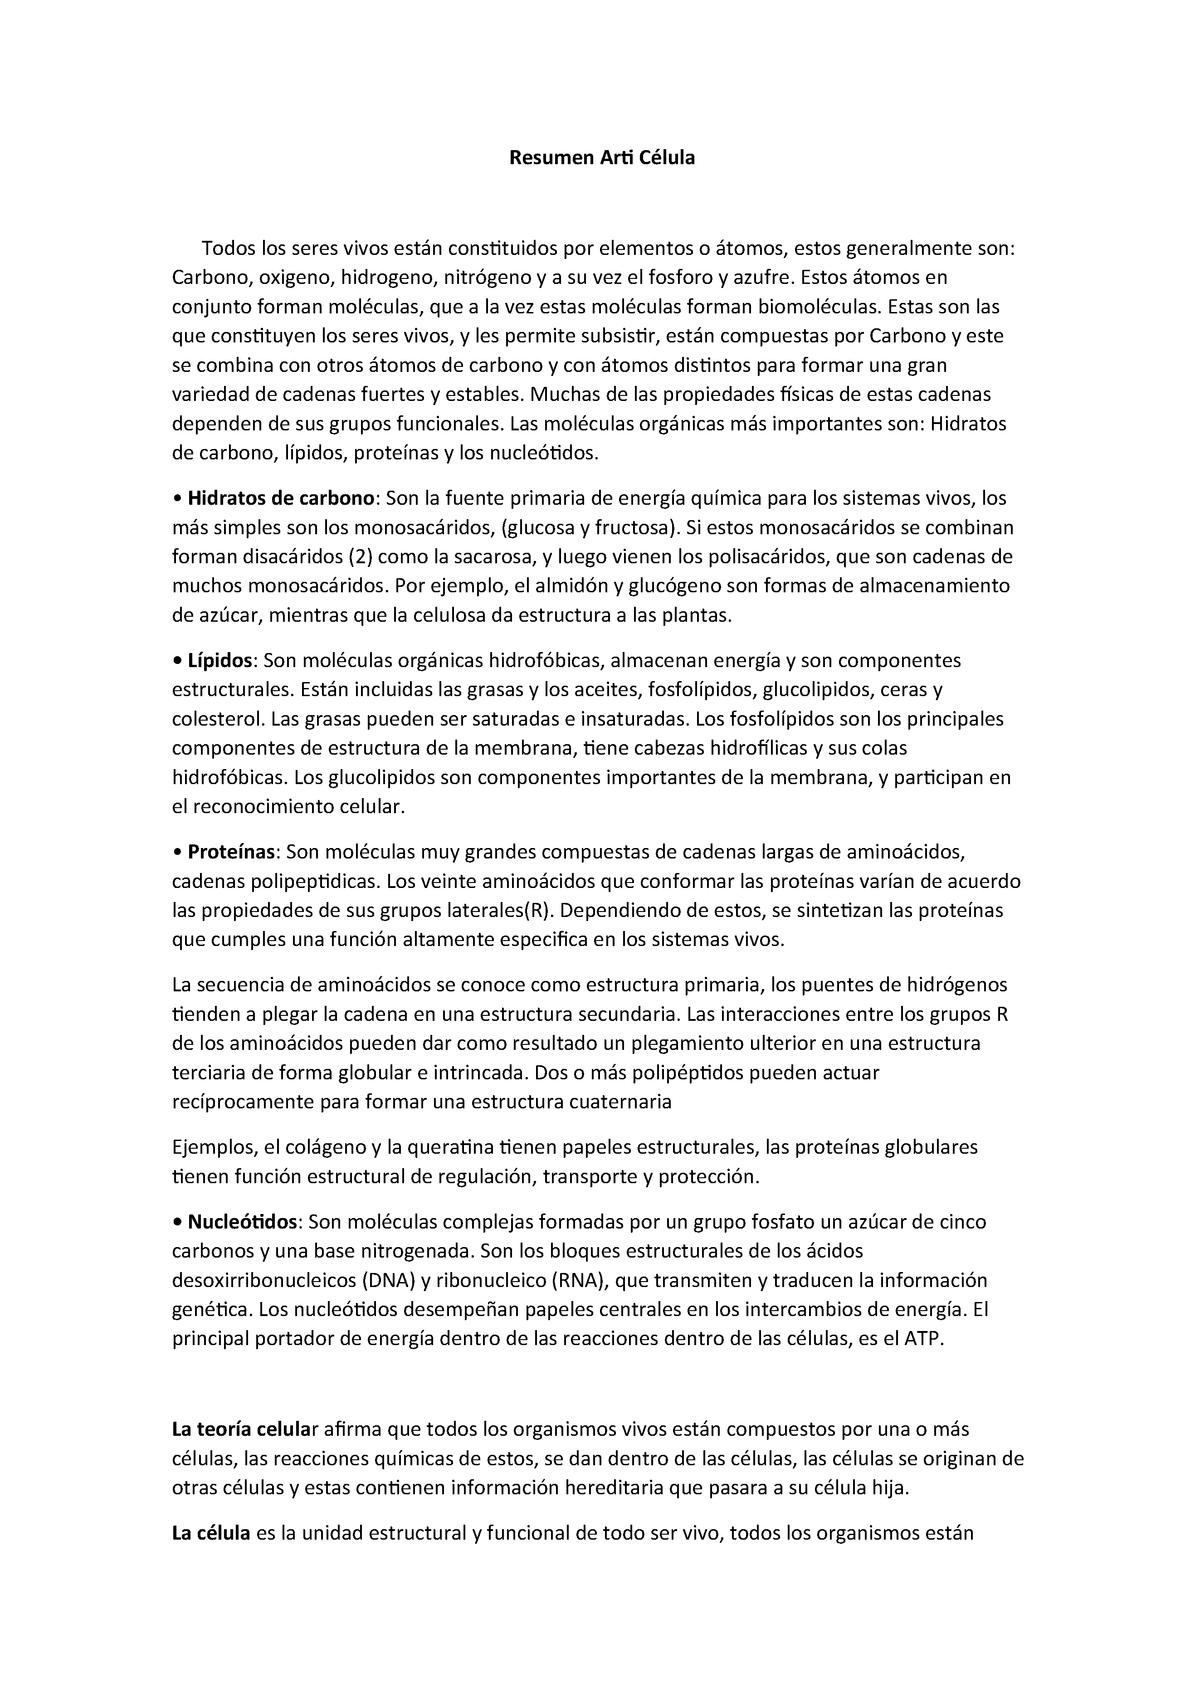 Resumen Arti Célula Biología Unmdp Studocu